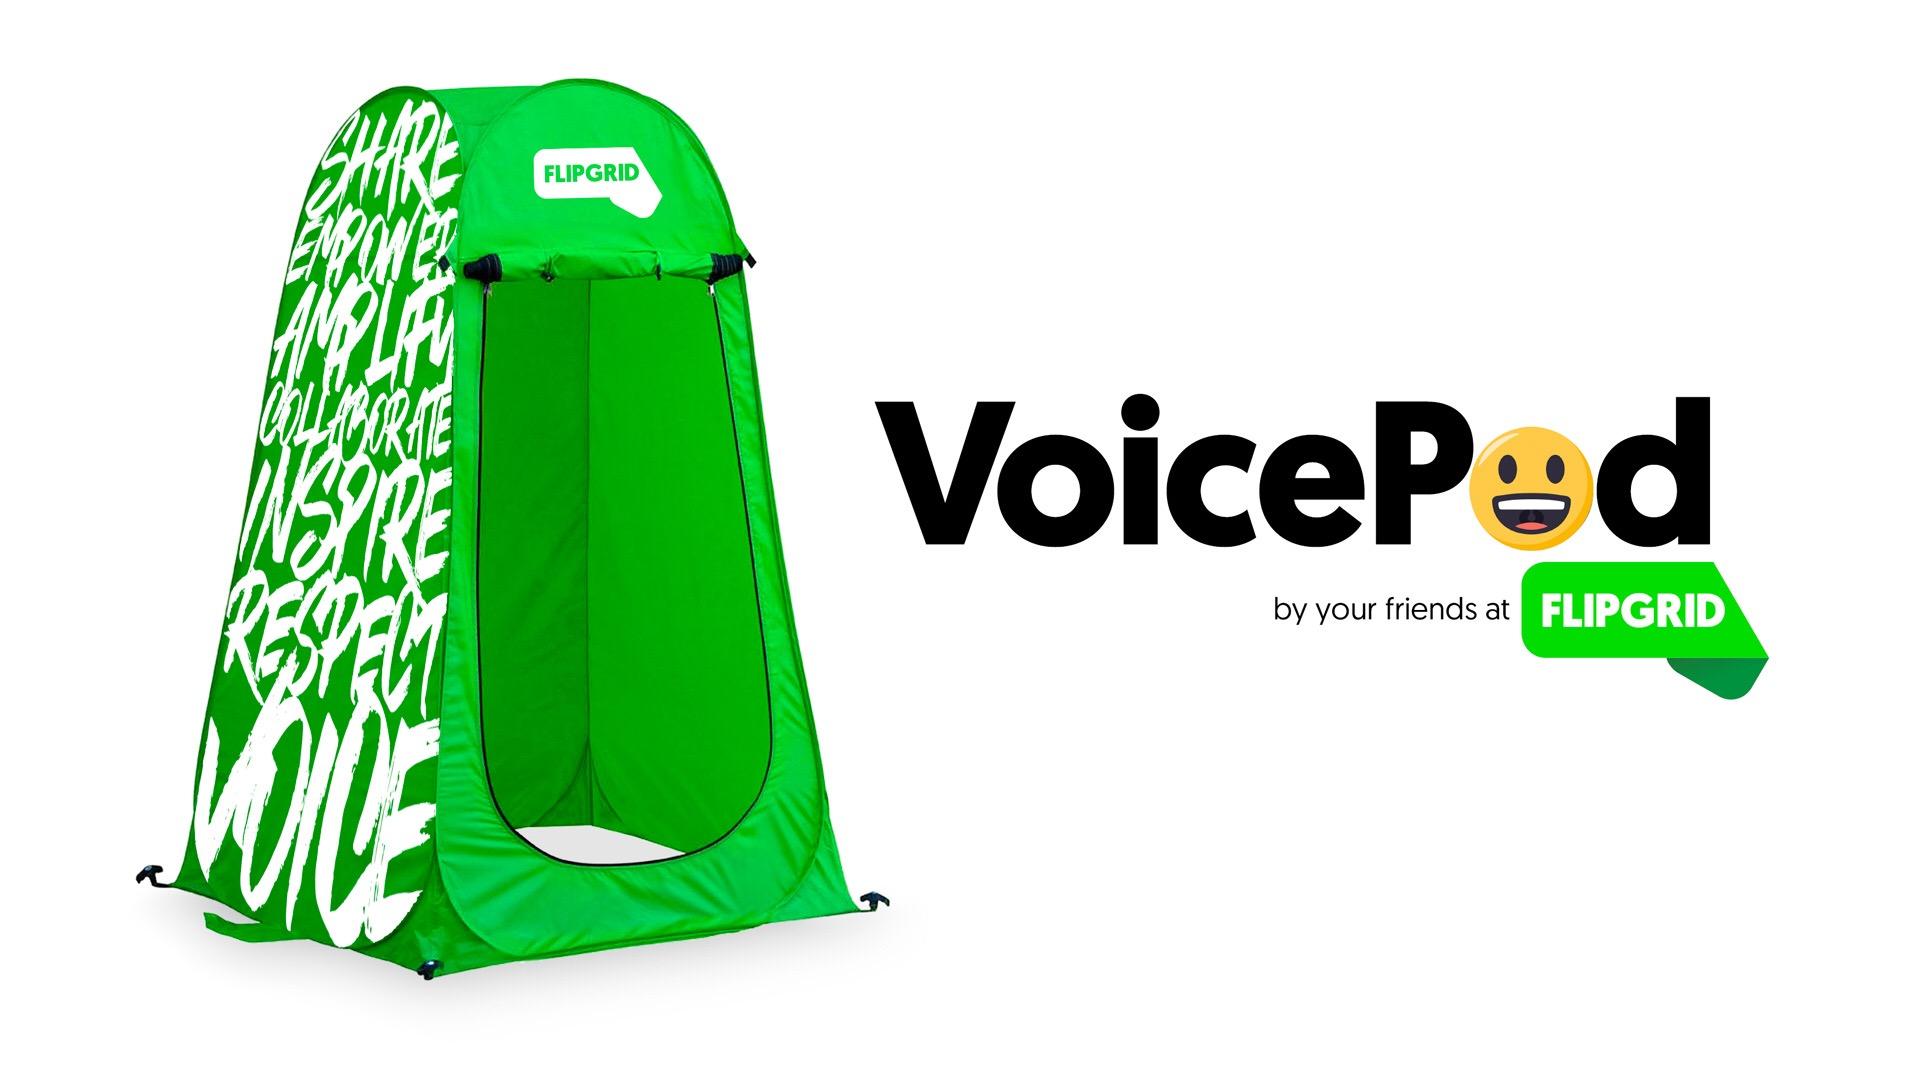 VoicePod.JPG